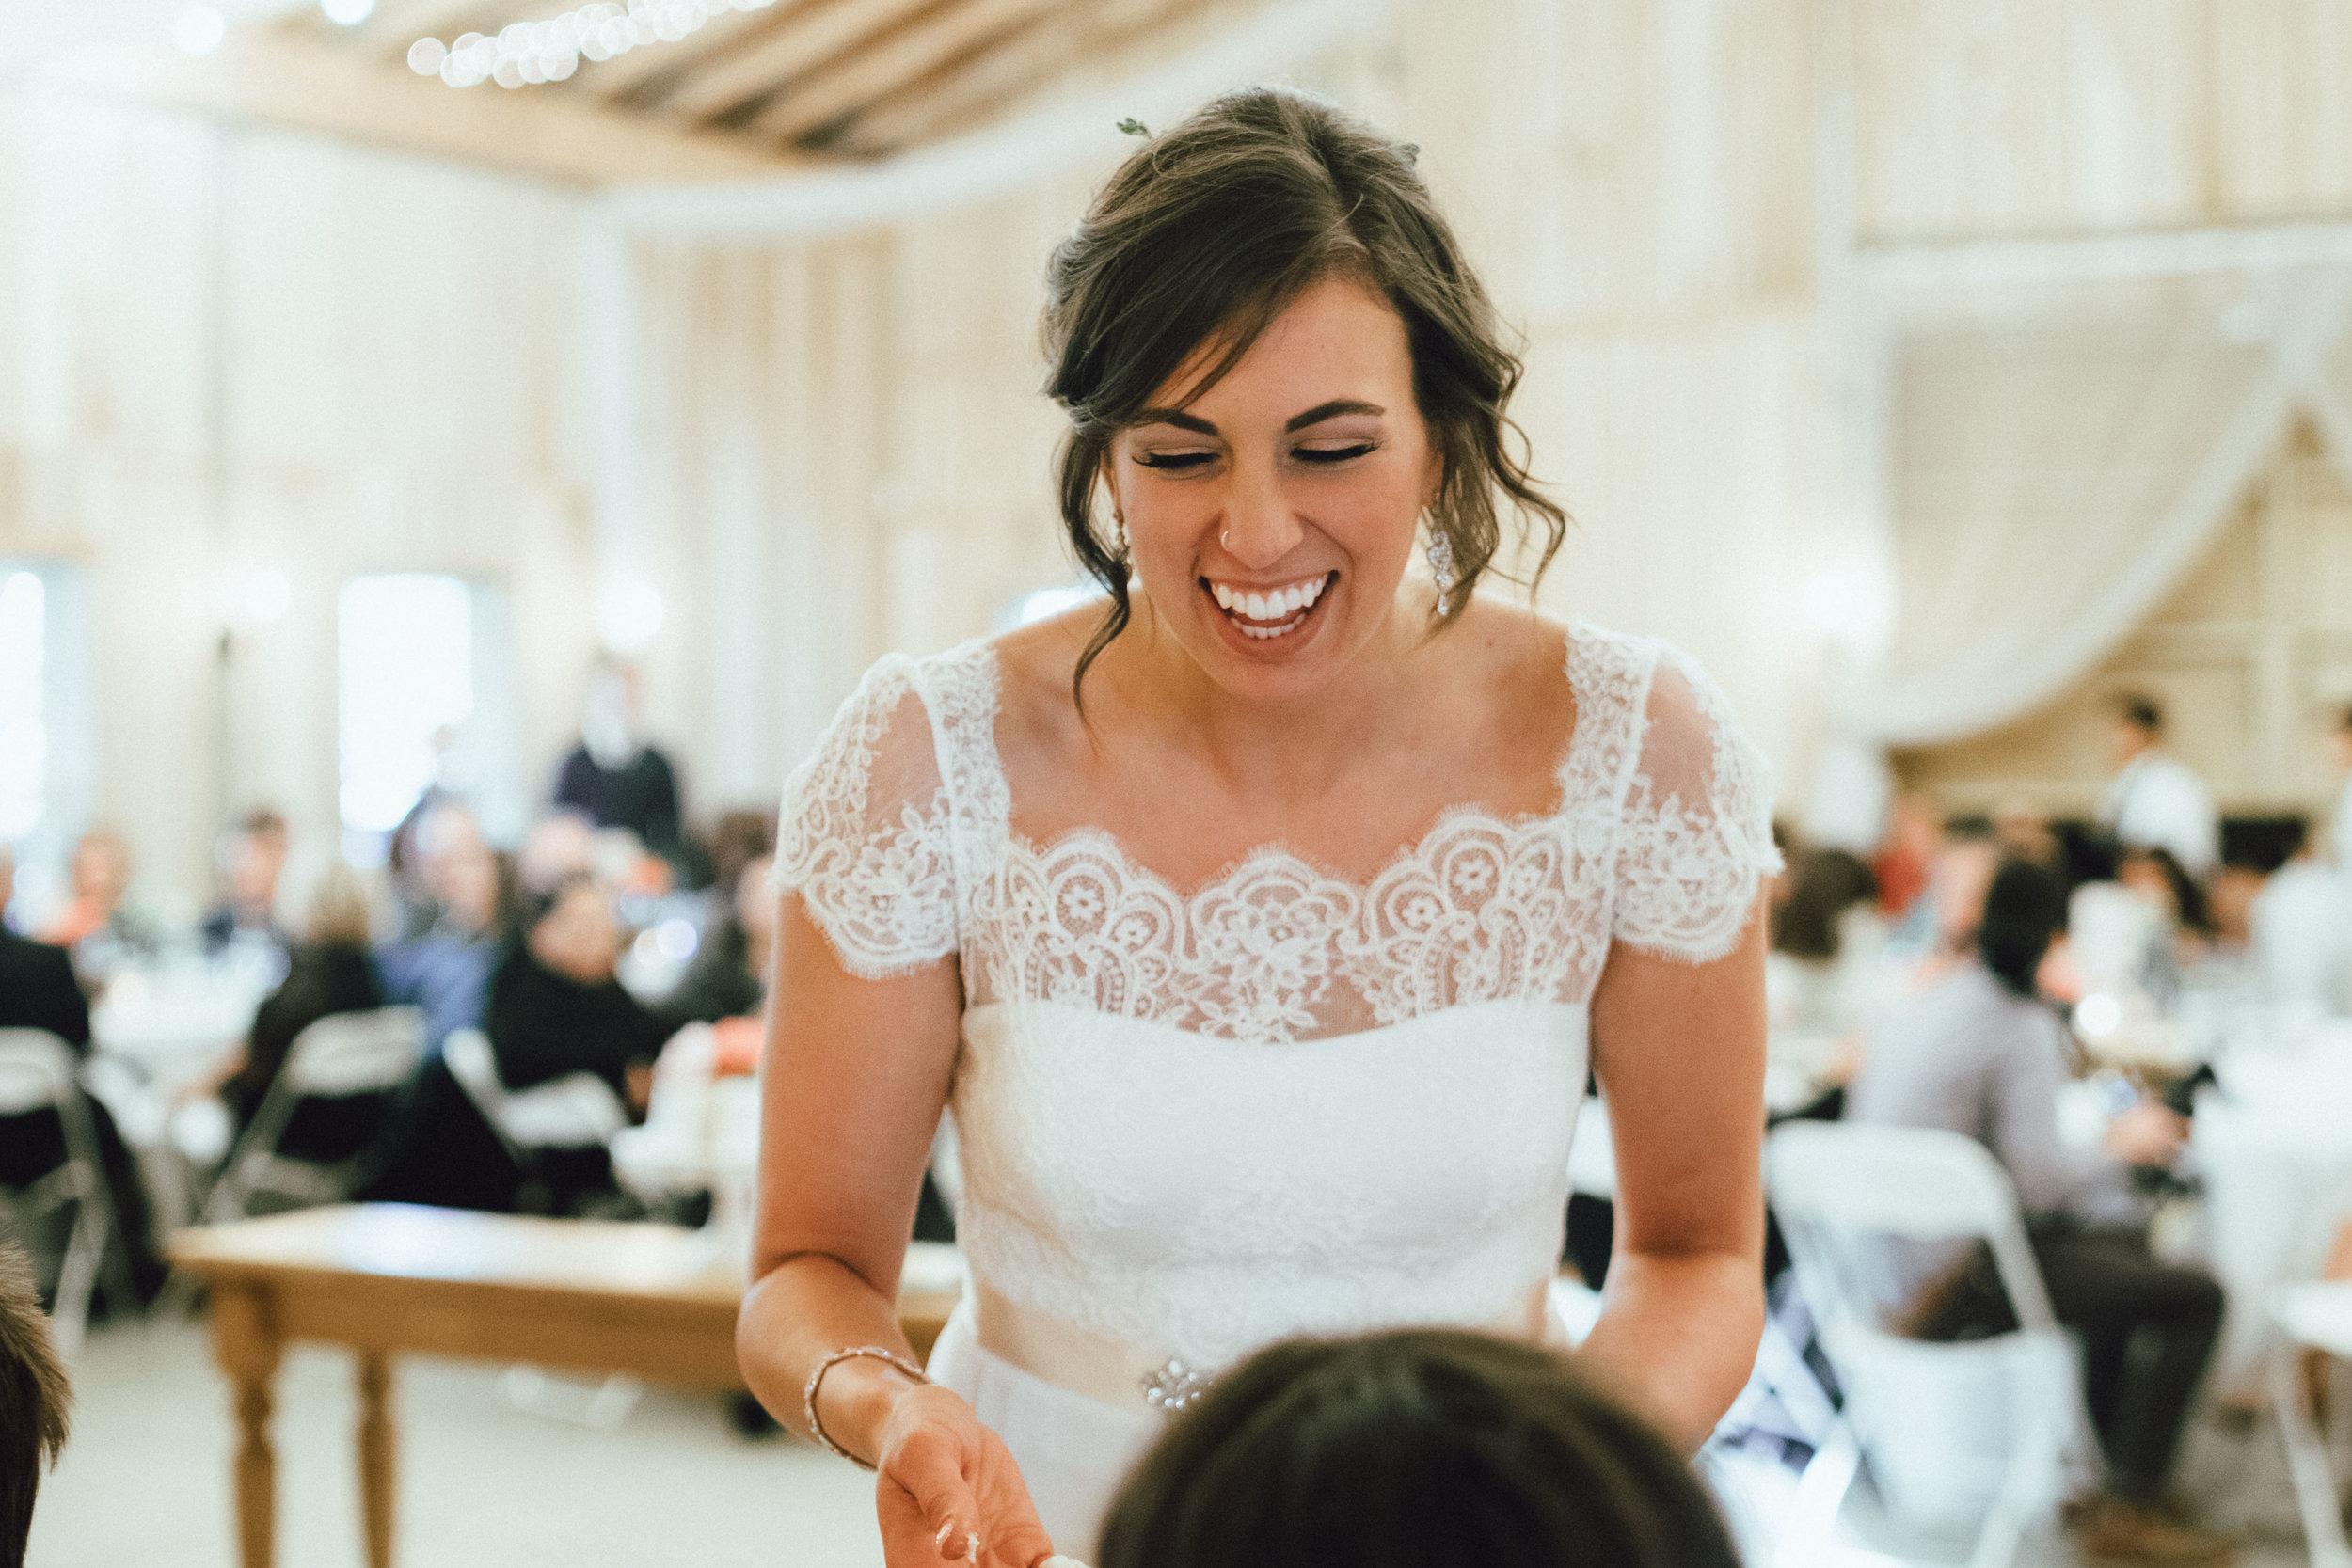 Steph-Ben-Blog-Indianapolis-Wedding-64.jpg